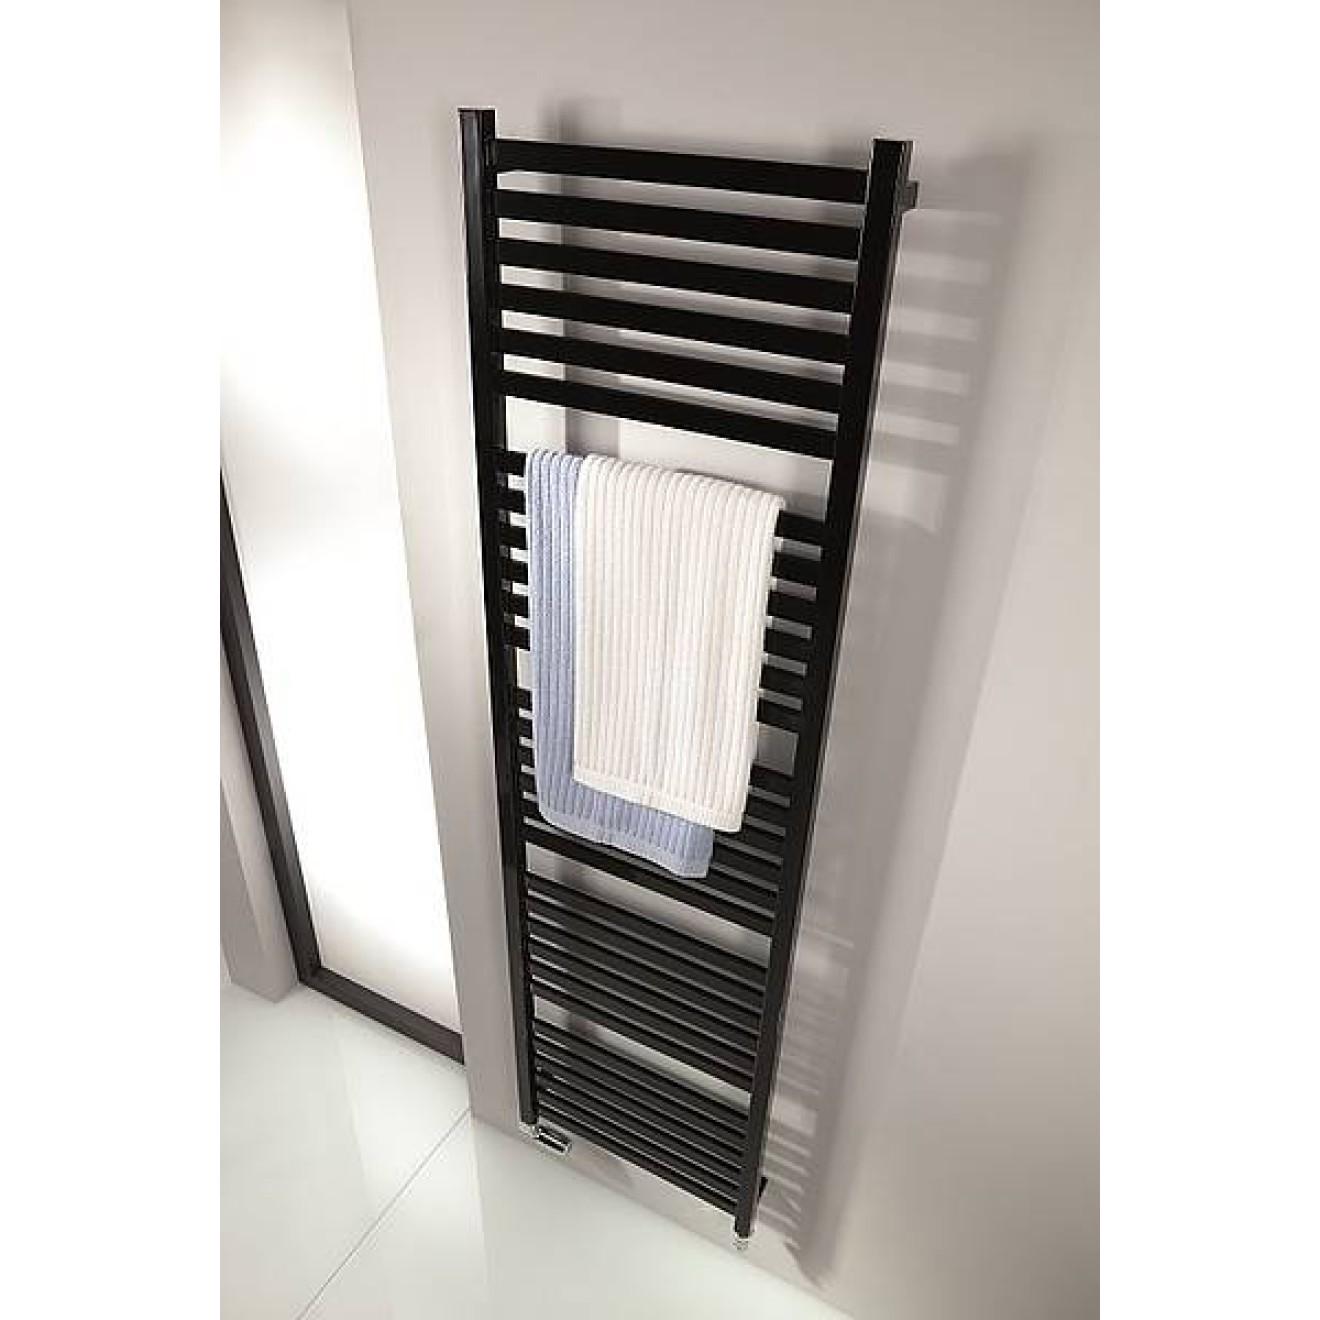 badheizk rper line aero 600 x 1200 mm treffpunkt bad der shop f r das moderne bad. Black Bedroom Furniture Sets. Home Design Ideas